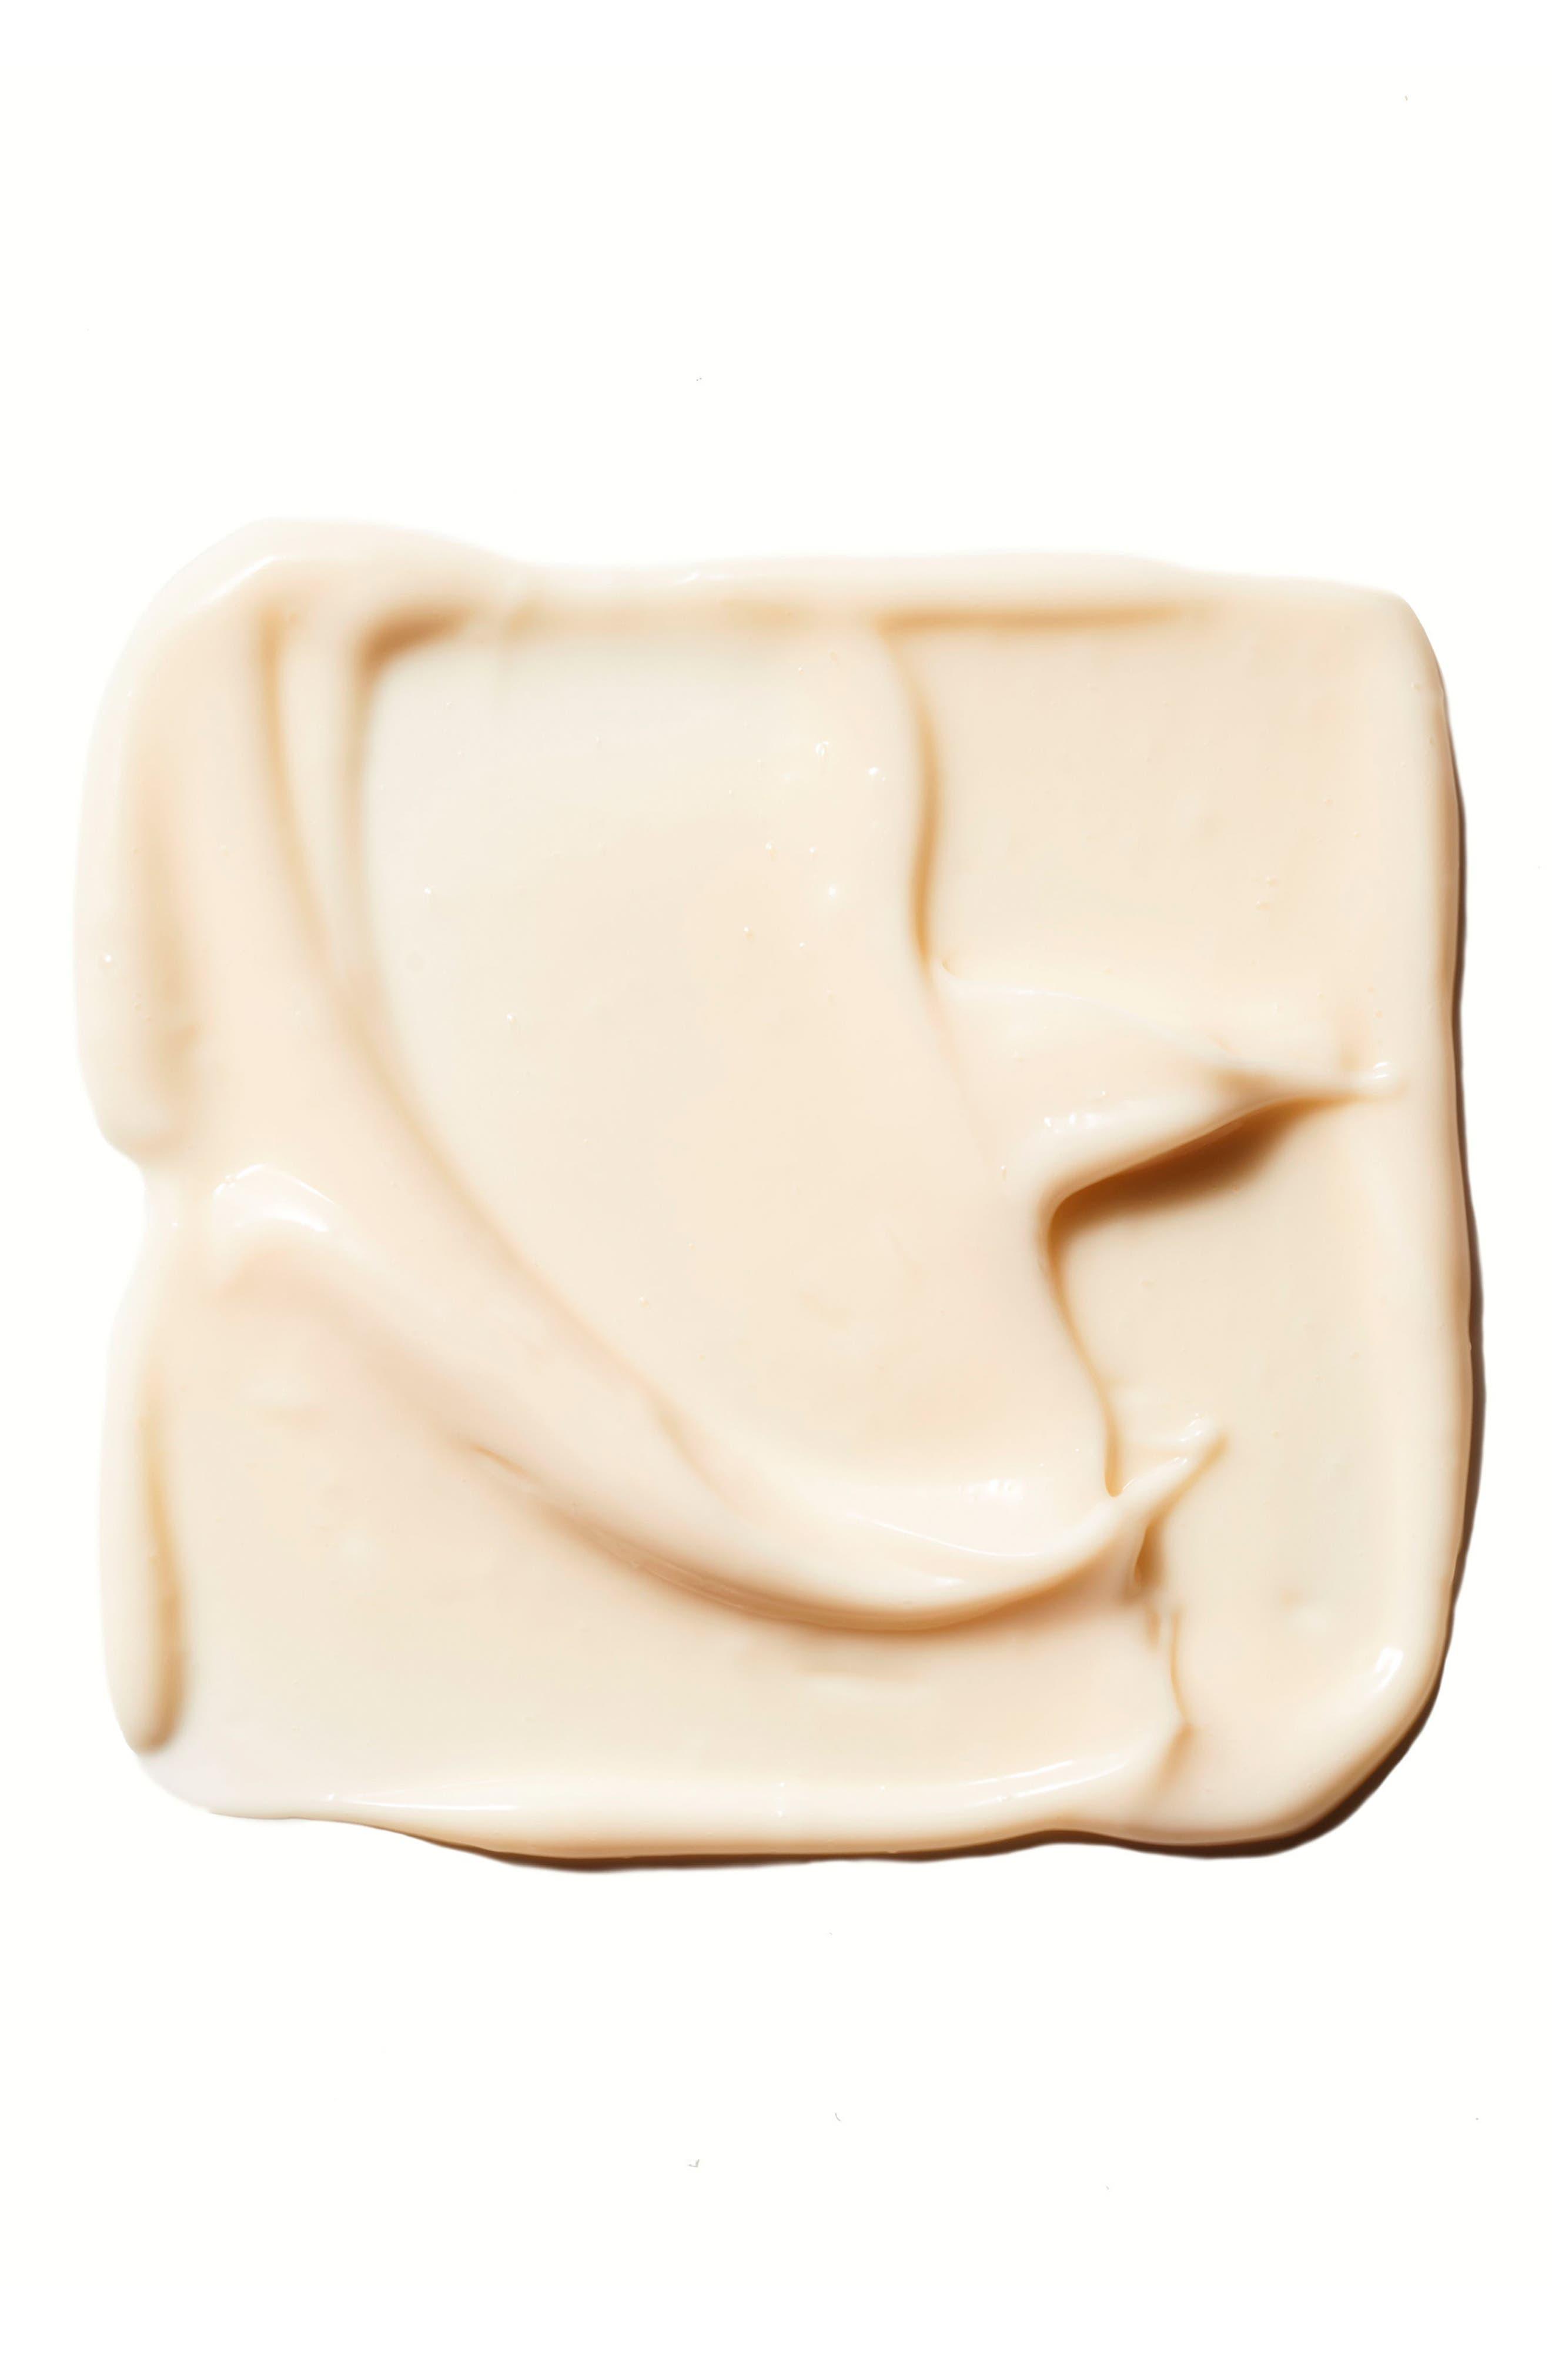 Rejuvenating Hand Cream,                             Alternate thumbnail 3, color,                             No Color